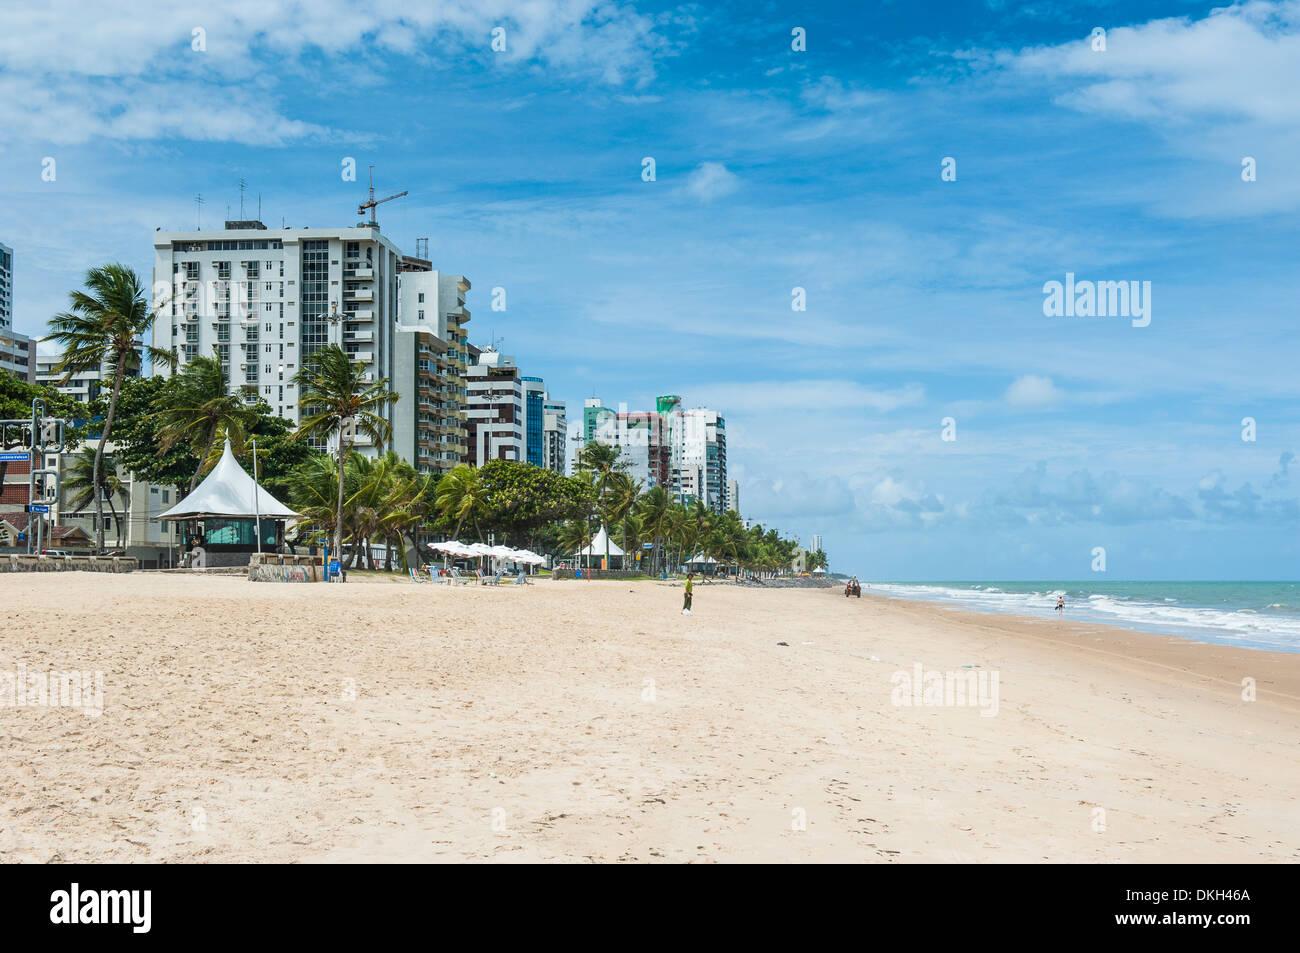 Boa Viagem Beach, Recife, Pernambuco, Brazil, South America - Stock Image